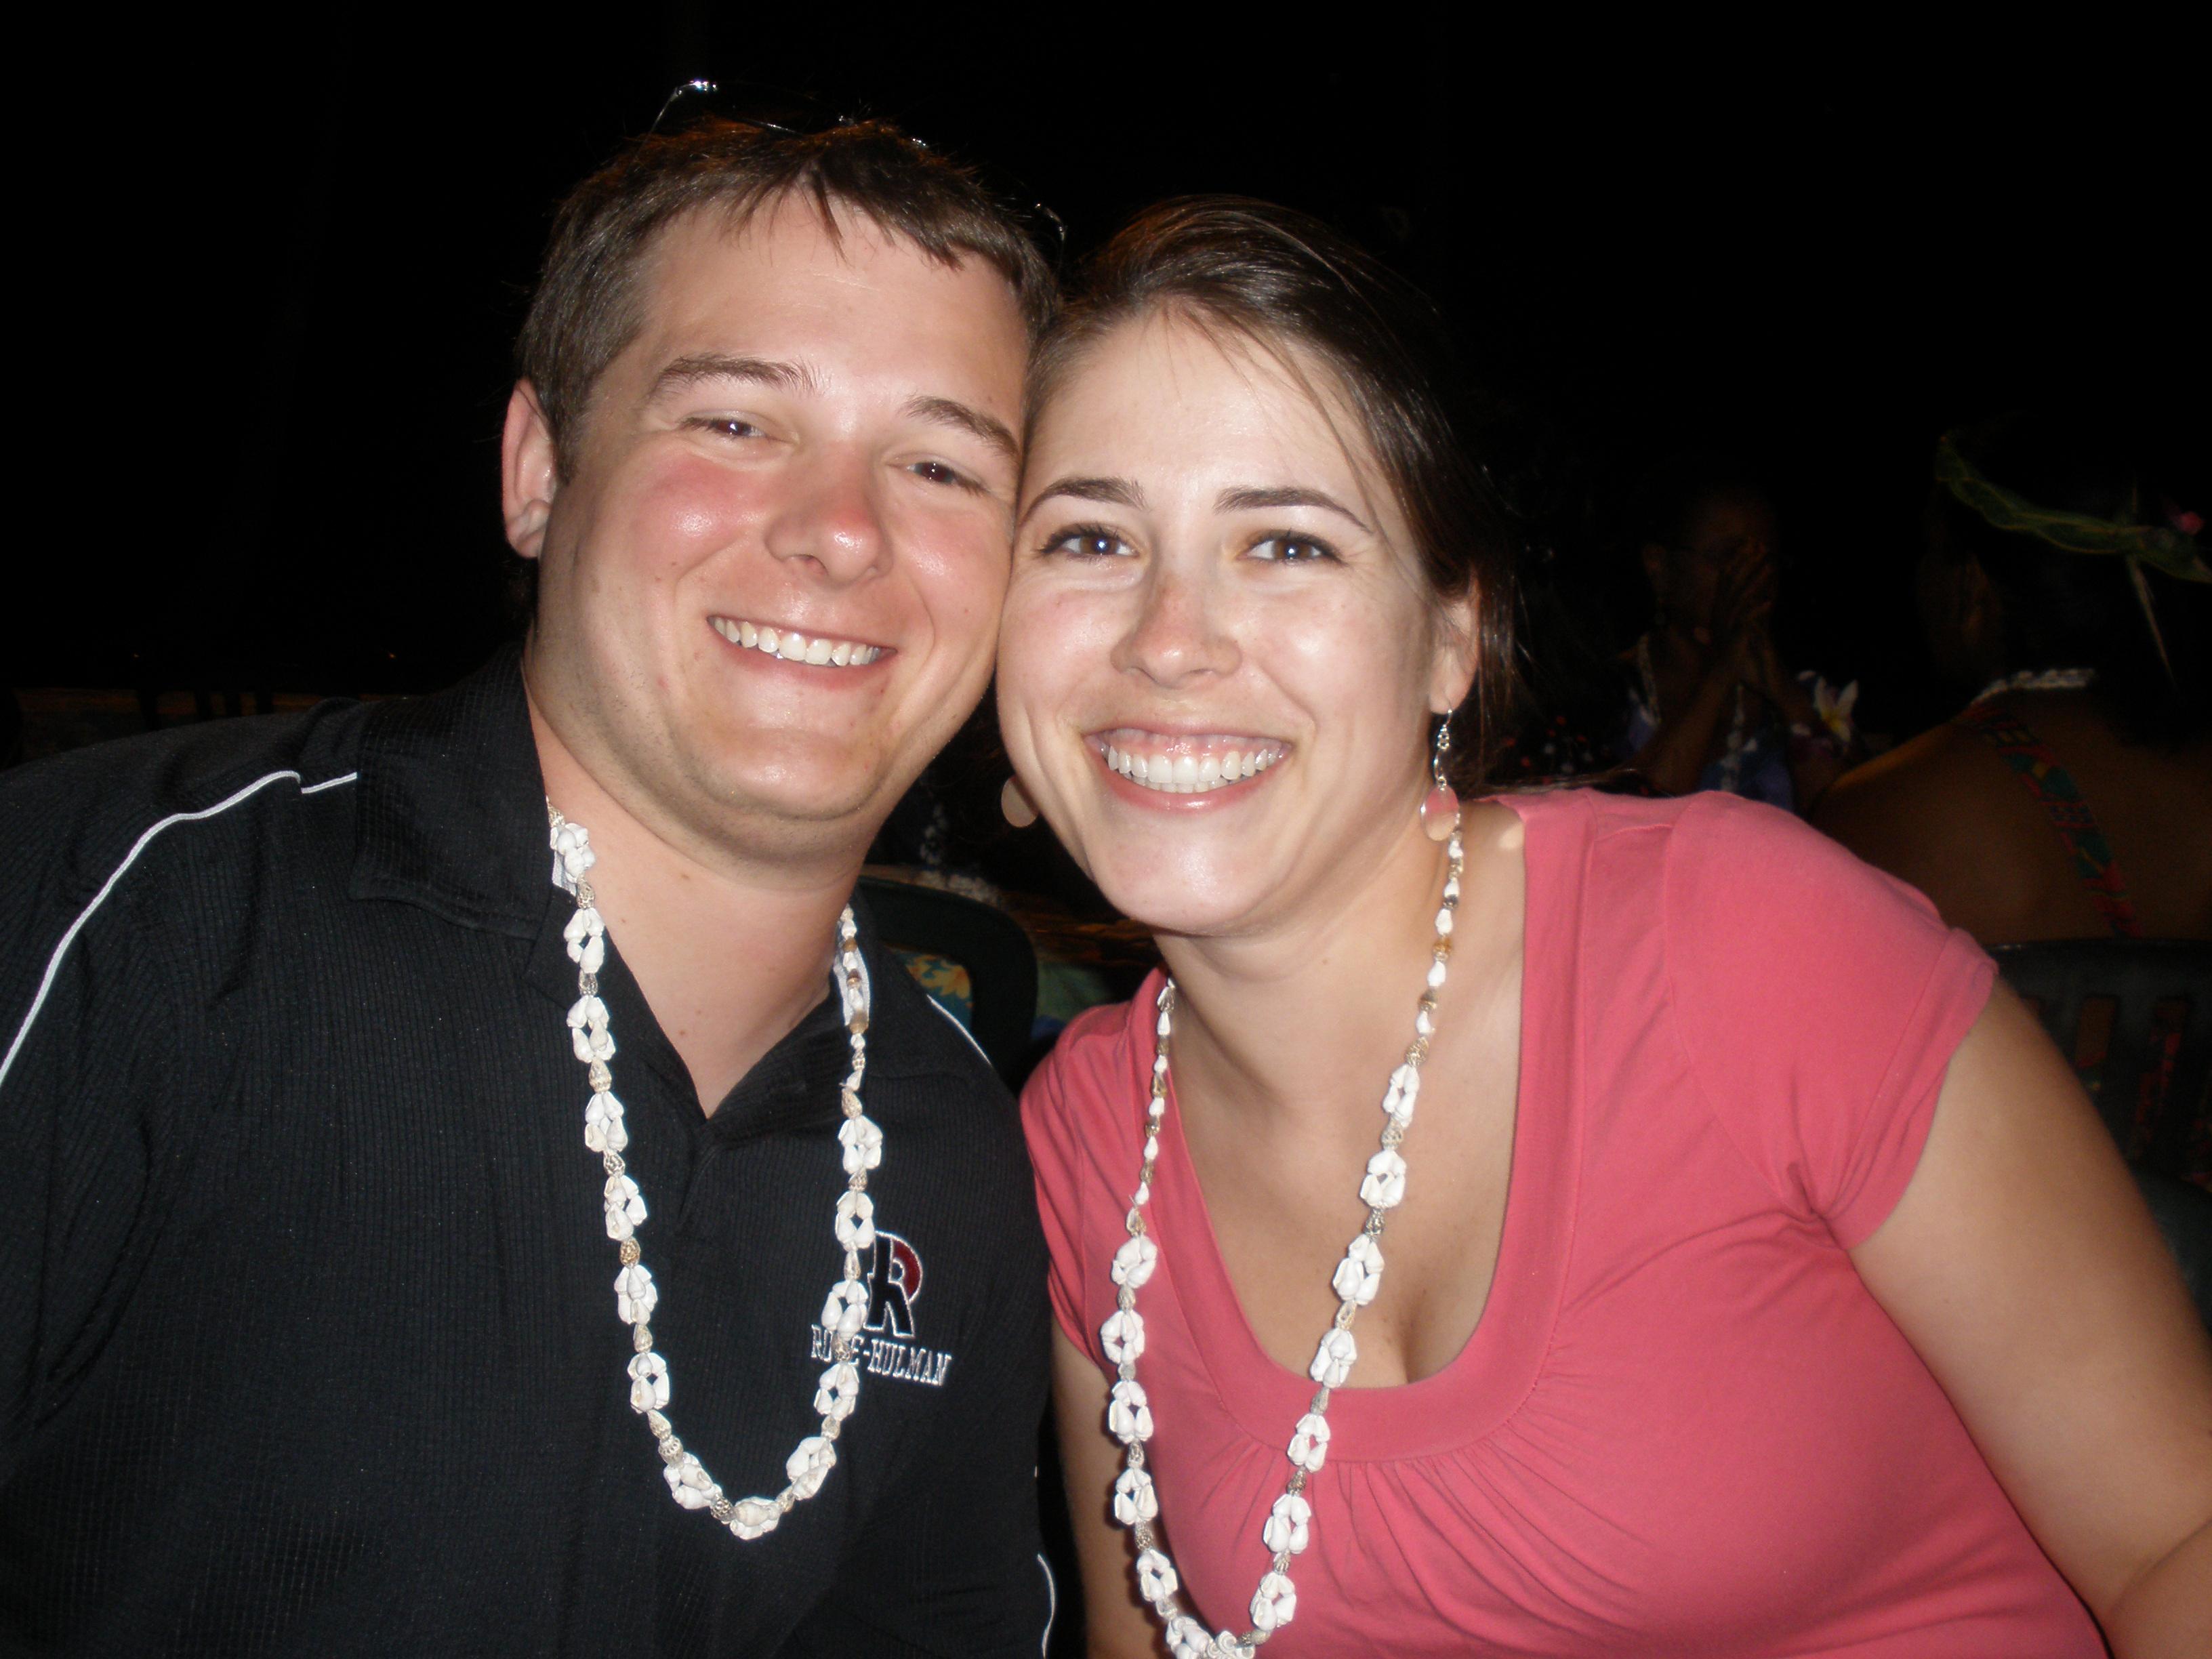 Greg and Jesseca Lyons